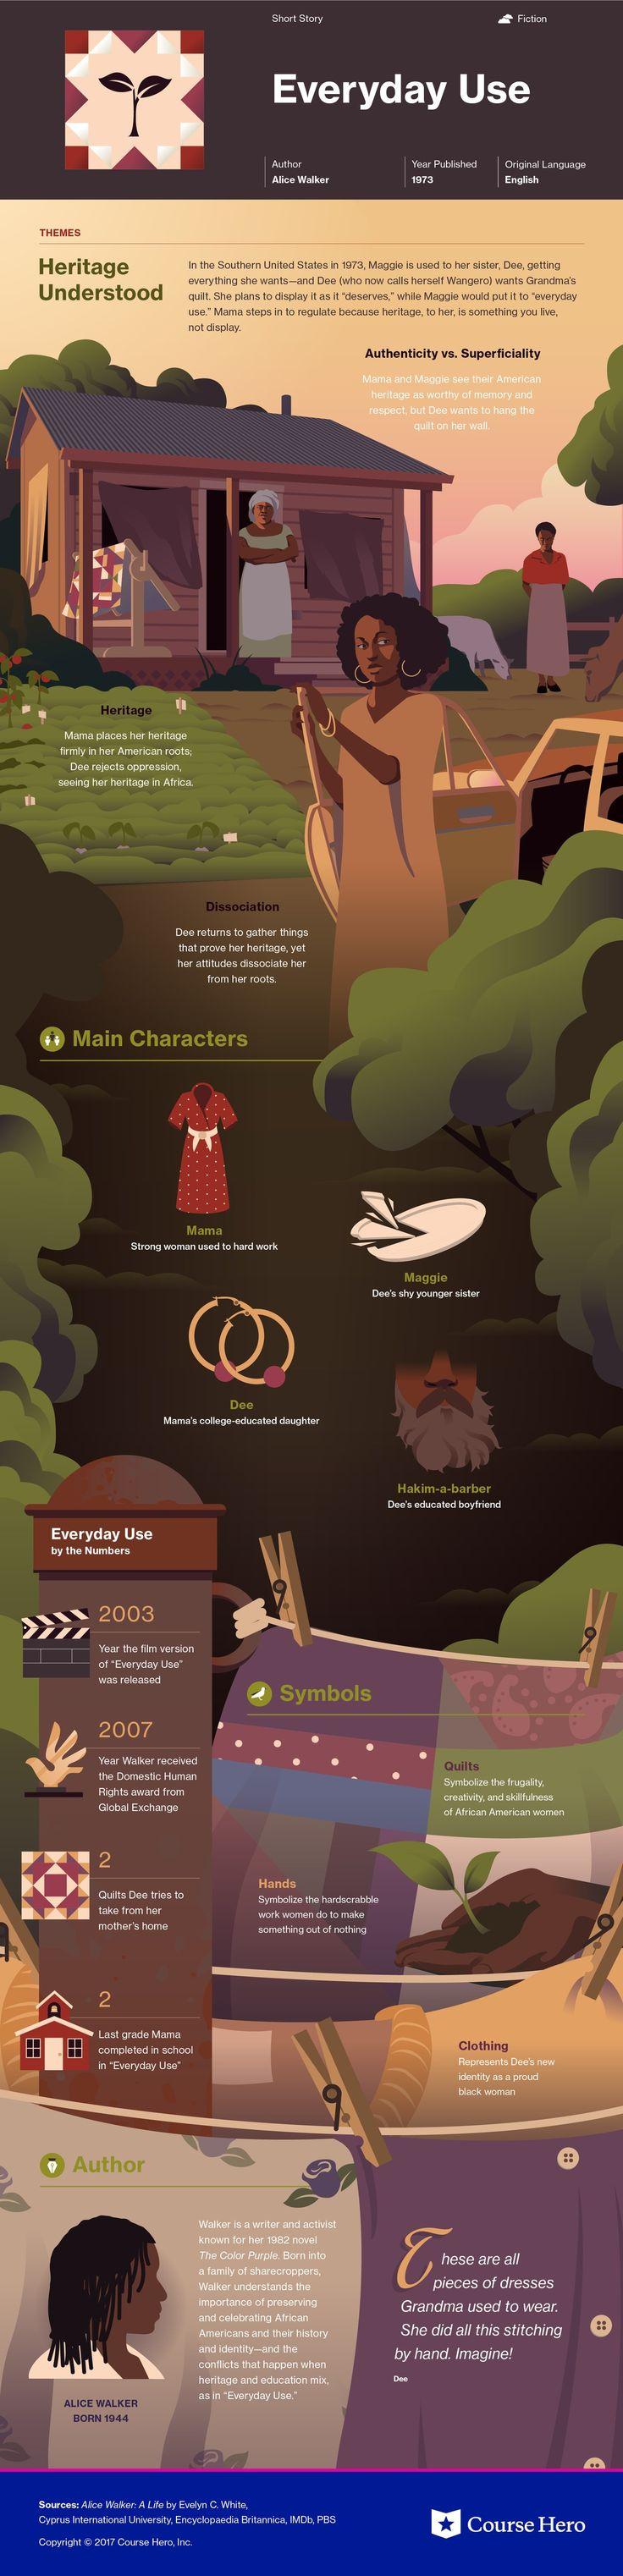 Everyday Use infographic